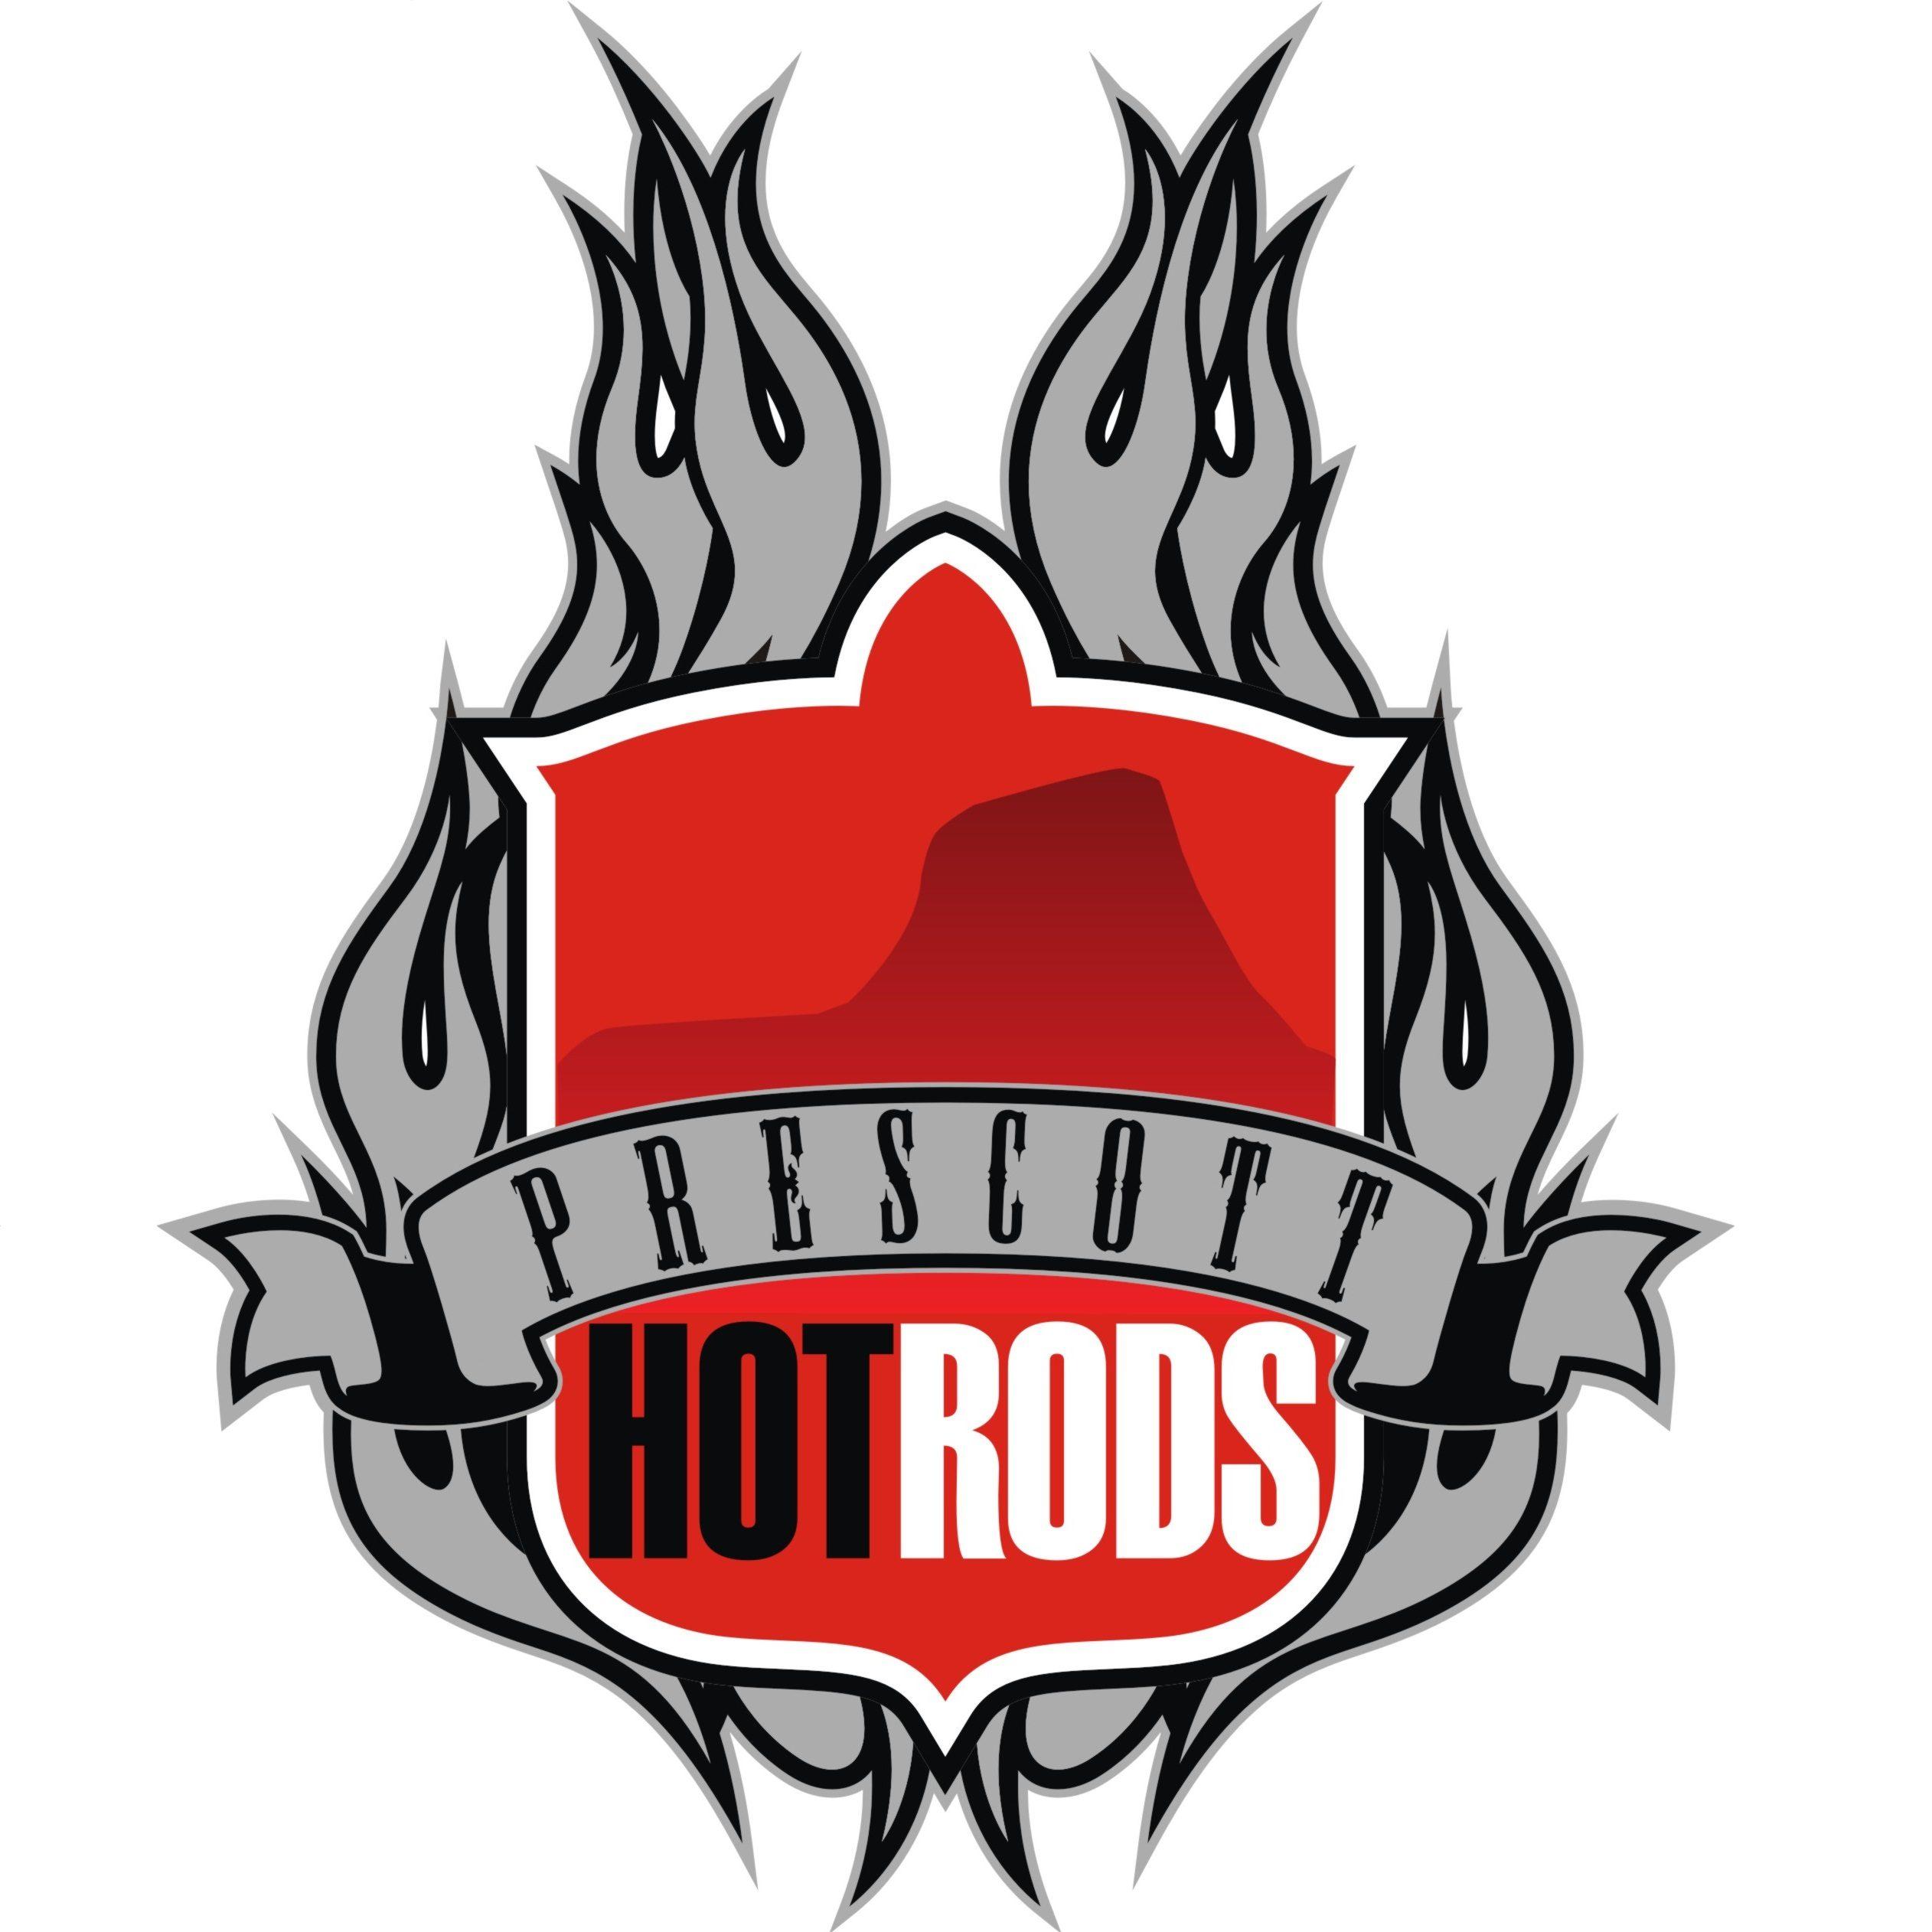 Prescott Hot Rods flame logo